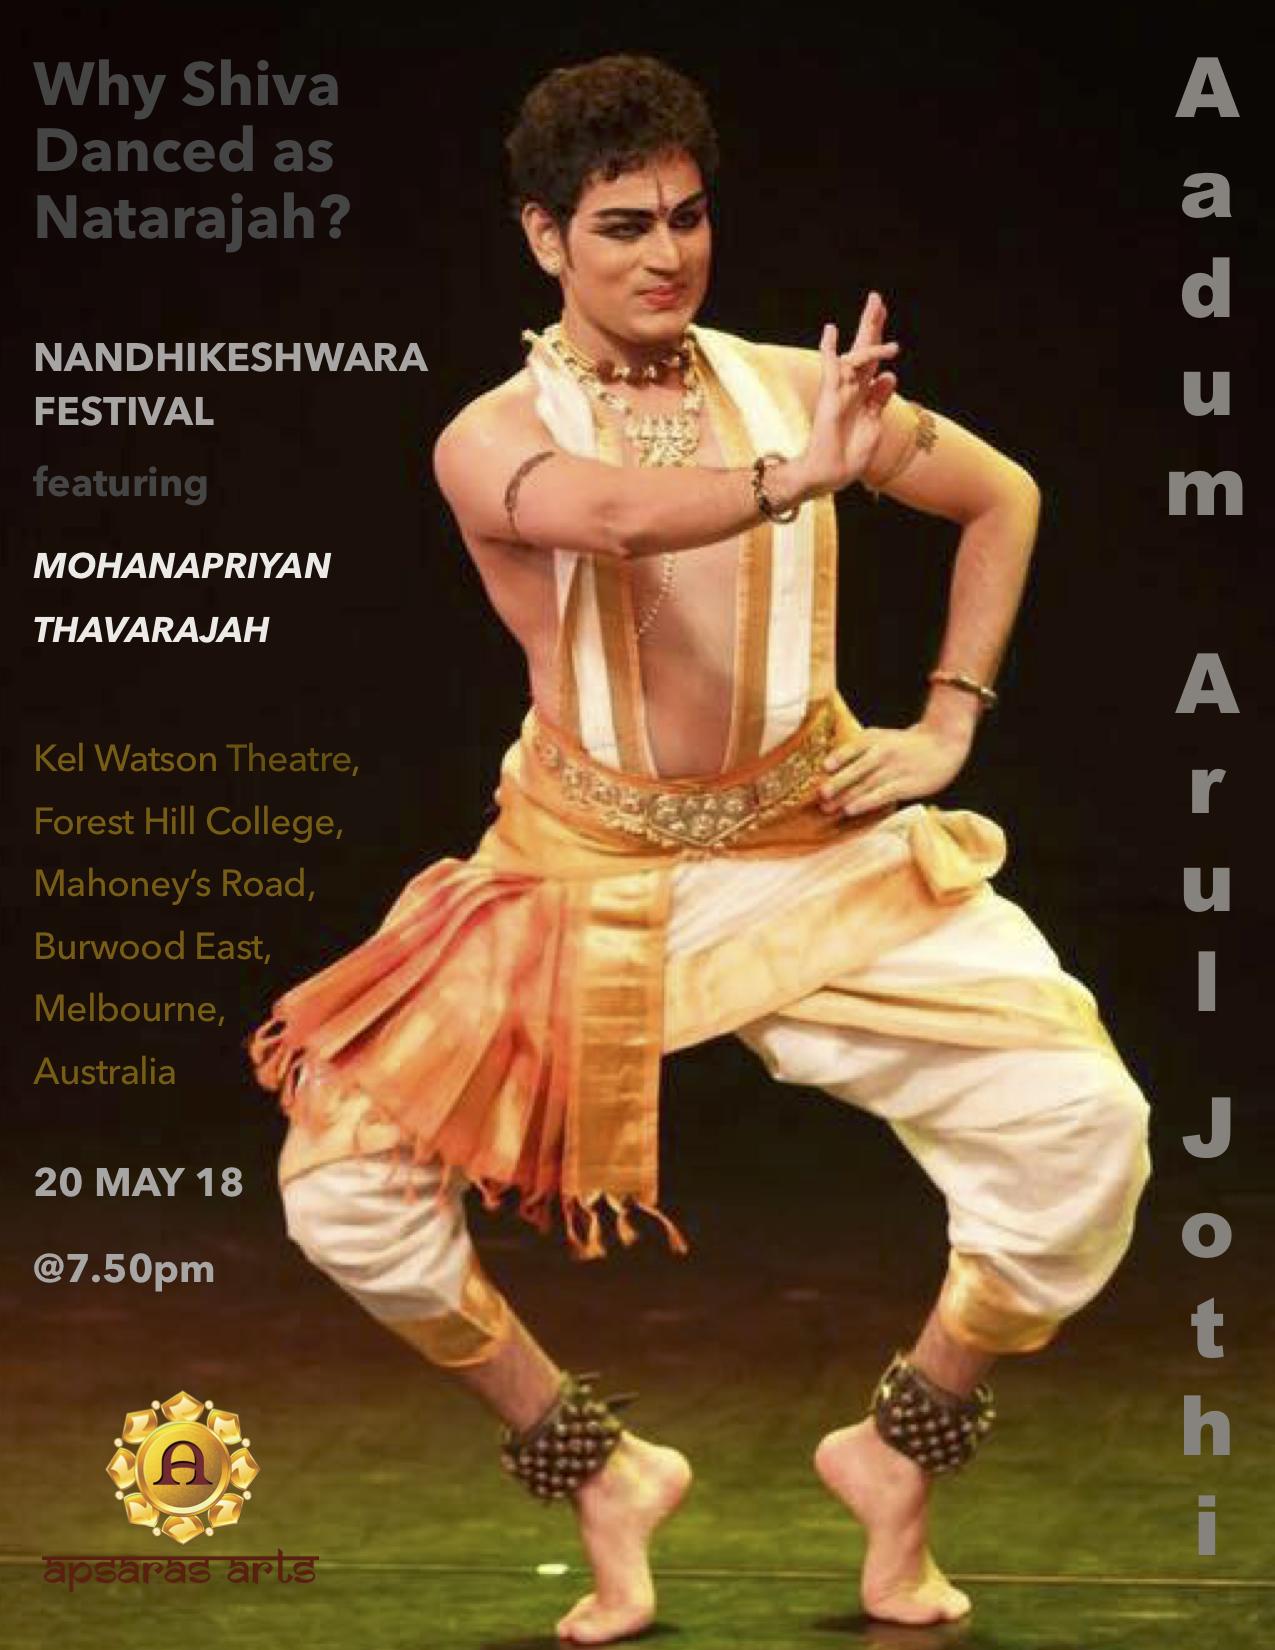 Aadum Arul Jothi – Dances of Divinity